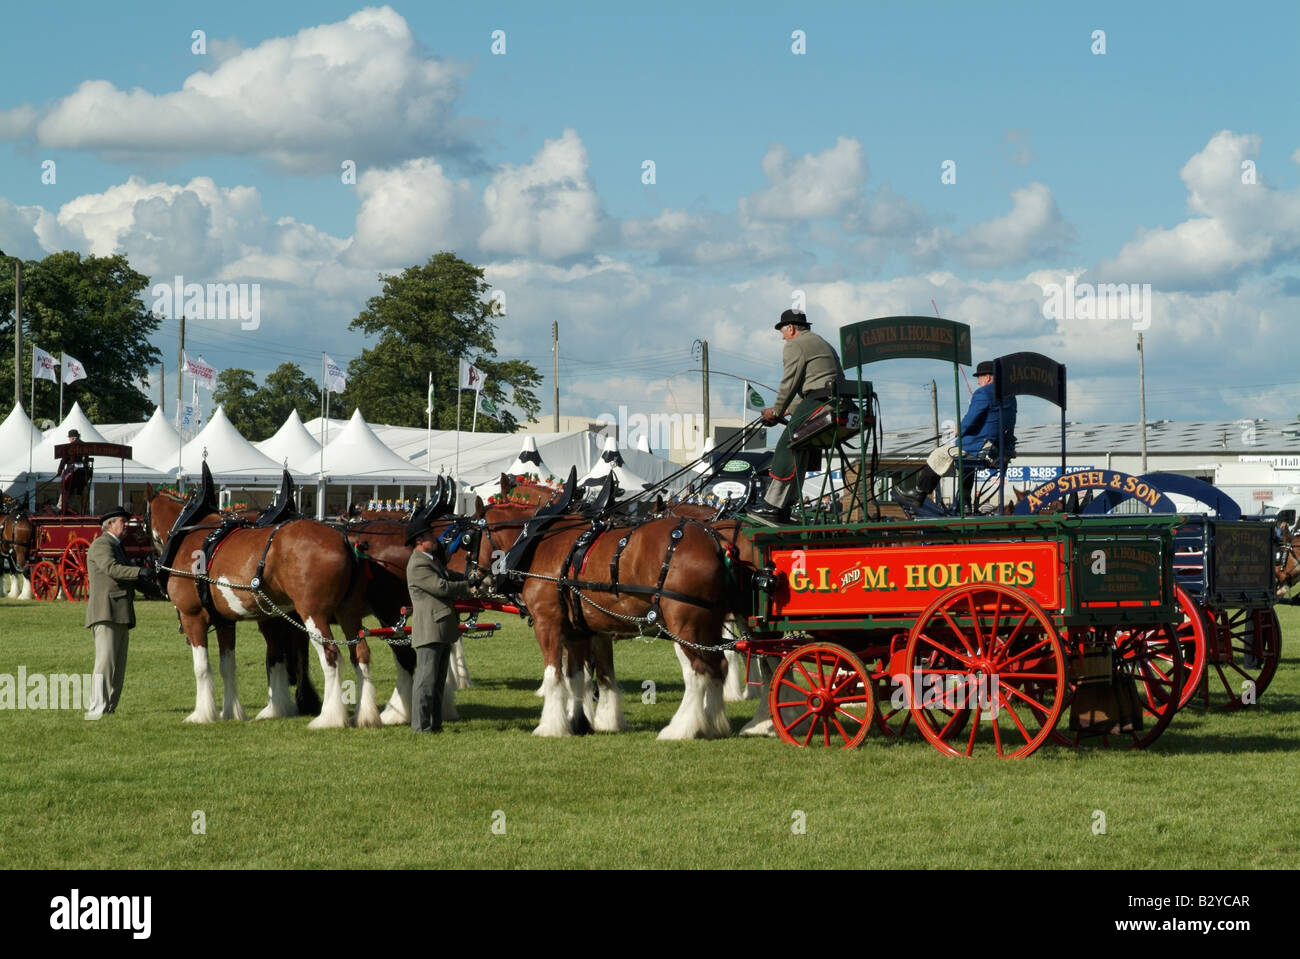 Heavy horse turnout (fours) at the 2008 Royal Highland Show, Ingliston, Edinburgh. - Stock Image